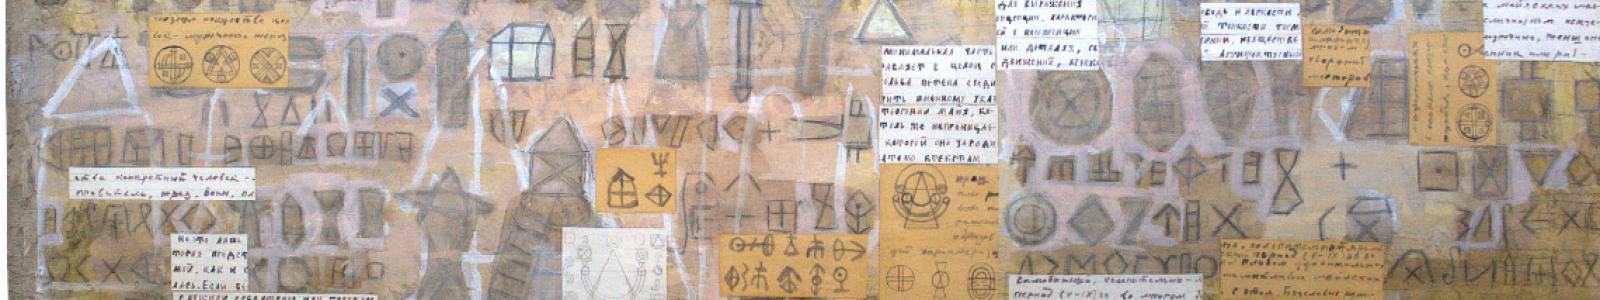 Gallery Painter Victor Buldakov